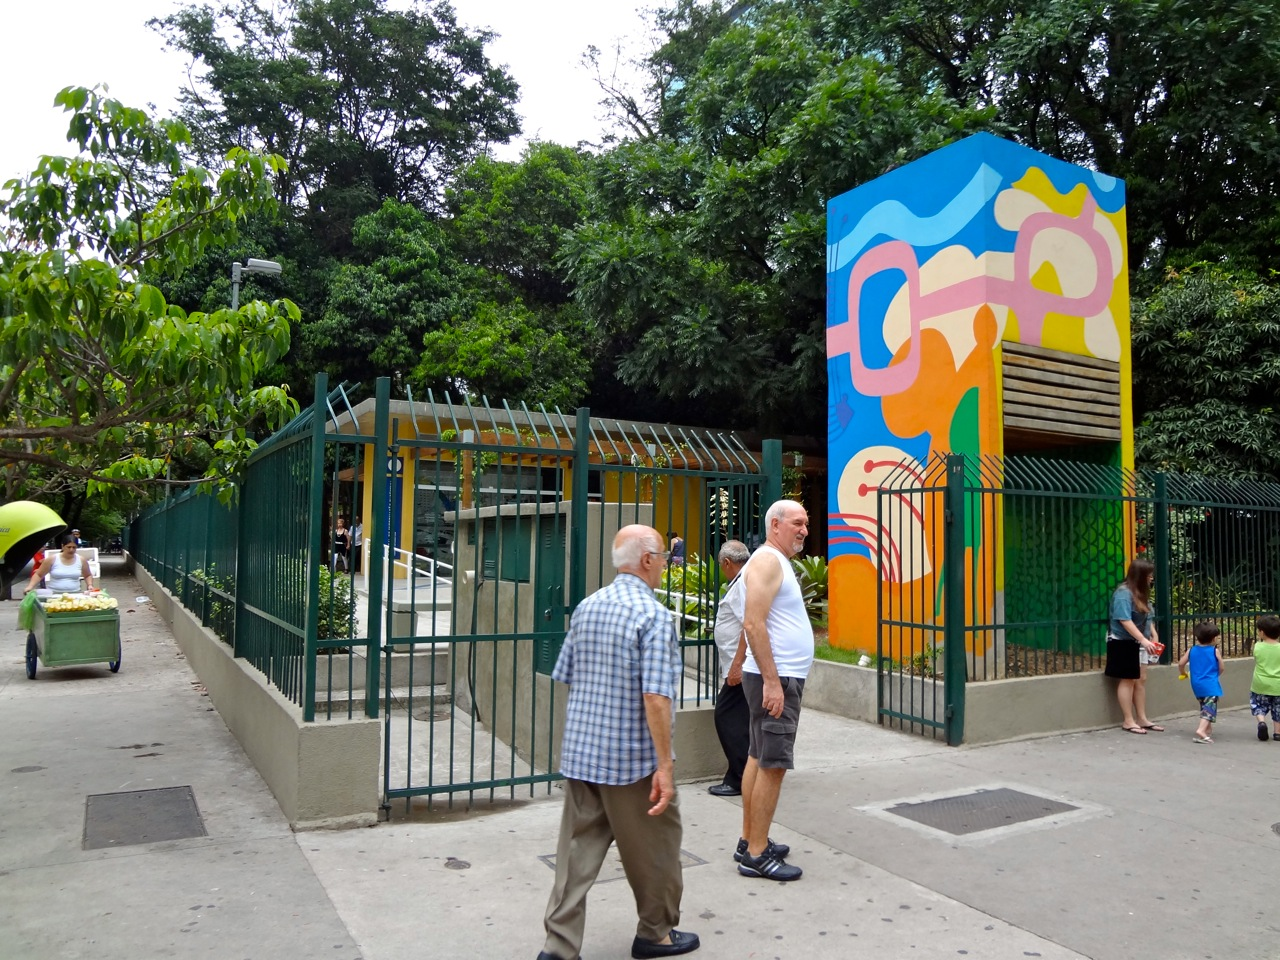 DSC00130 - Série Avenida Paulista: a Villa Fortunata e o parque. Como é o nome mesmo?